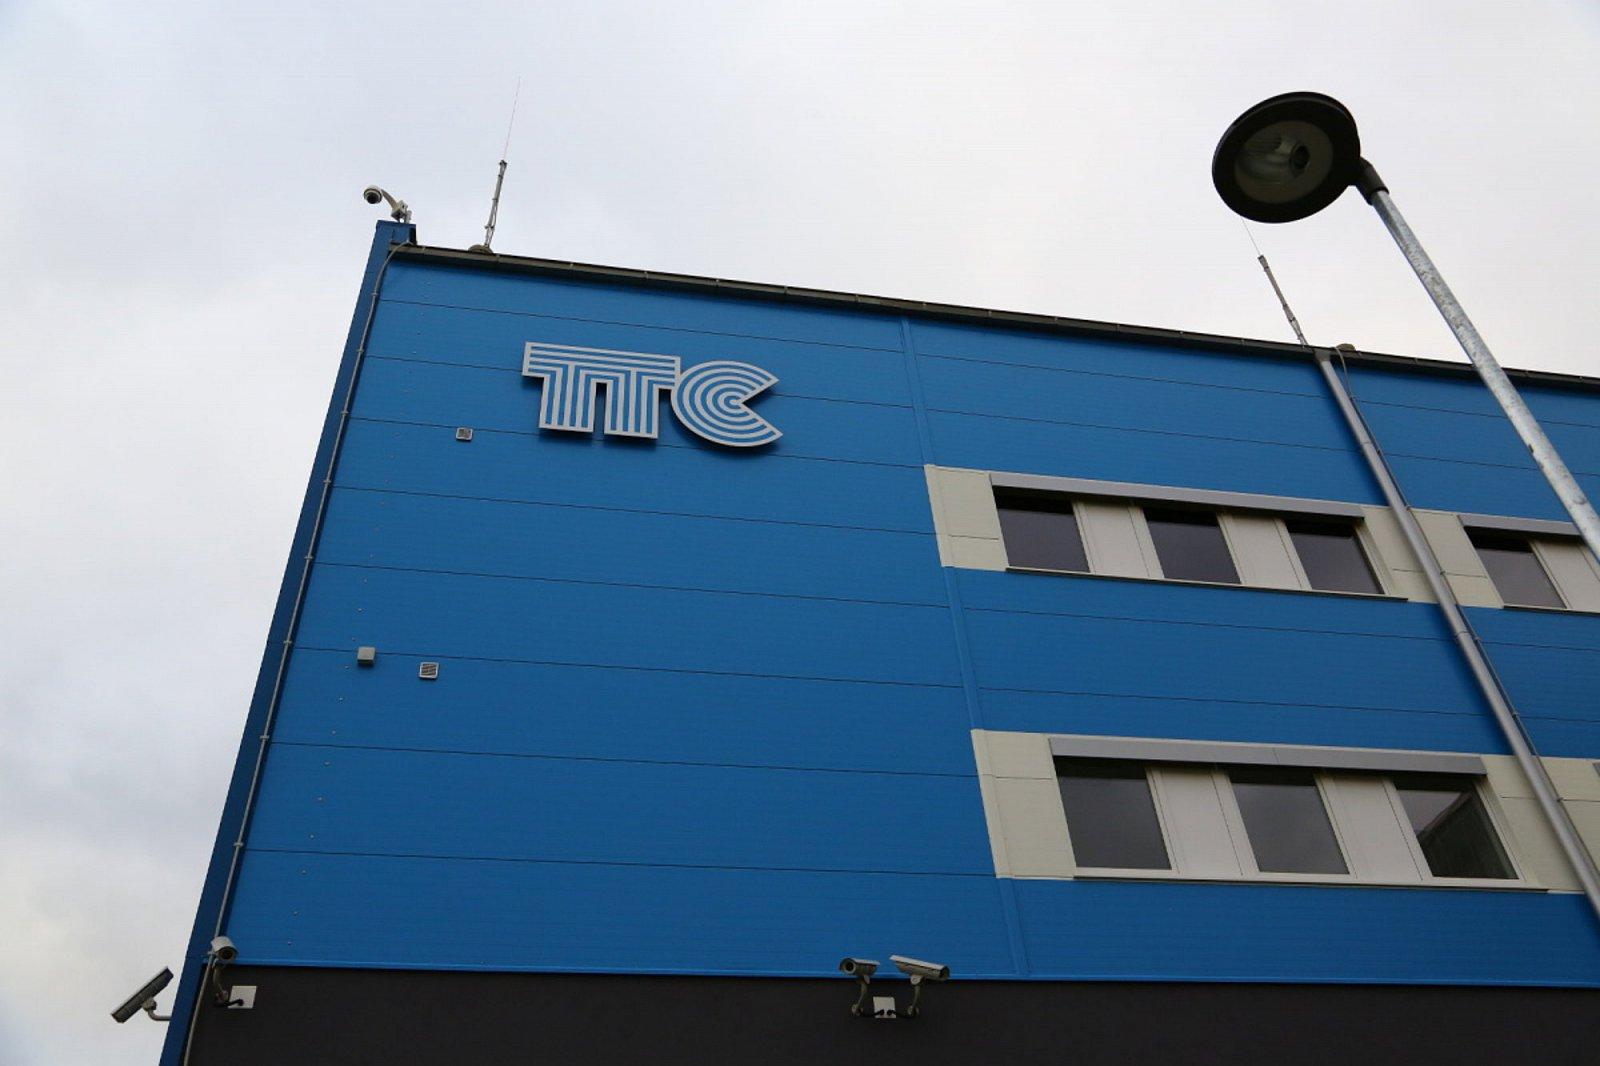 Datacentrum TTC Teleport (Sazečská, Praha)